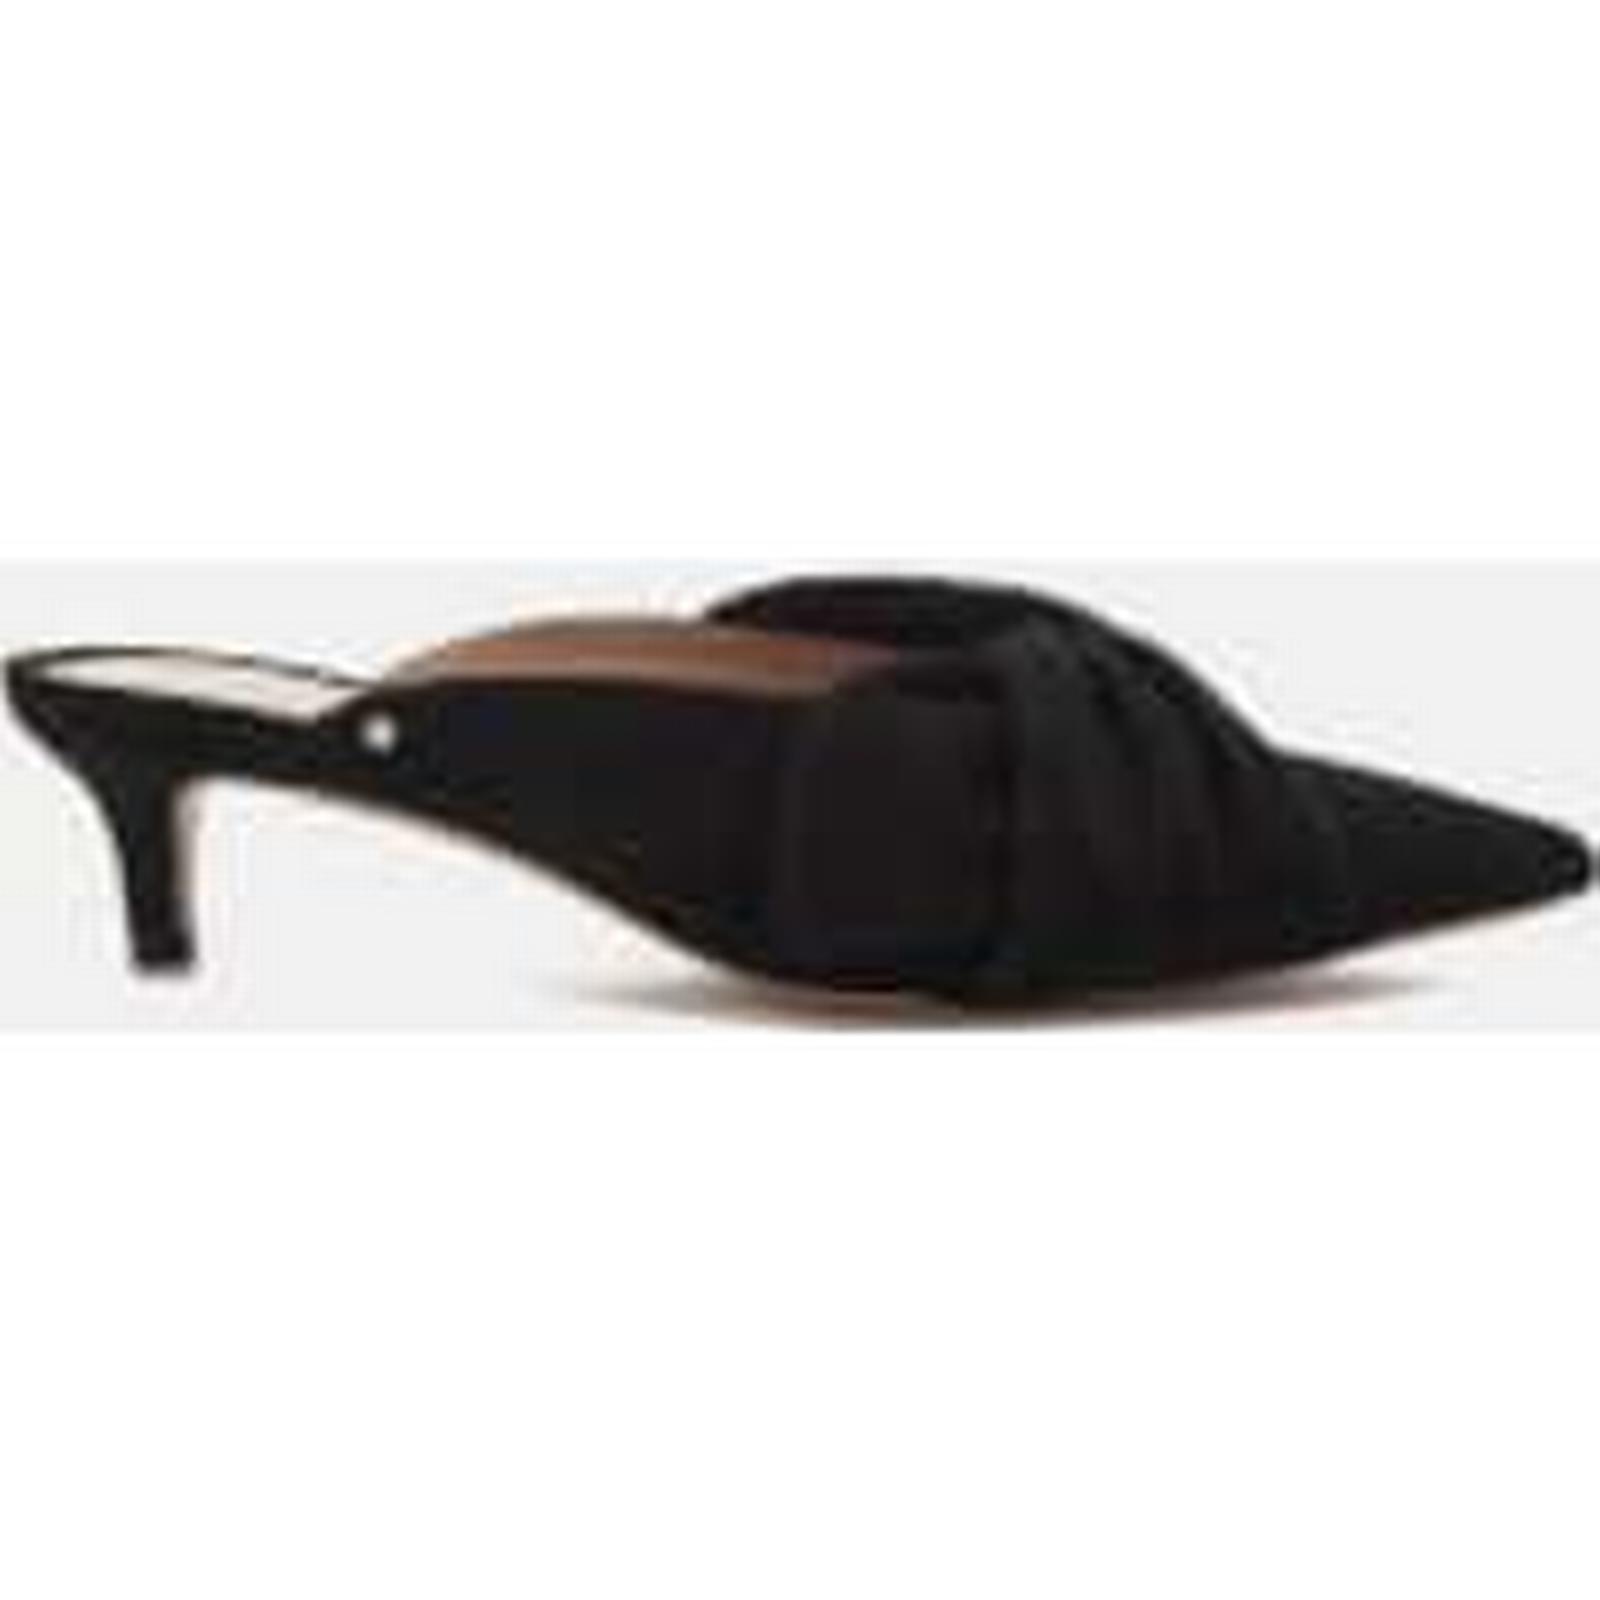 Sam Edelman Women's Heels Laney Suede Pointed Kitten Heels Women's - Black ee138f